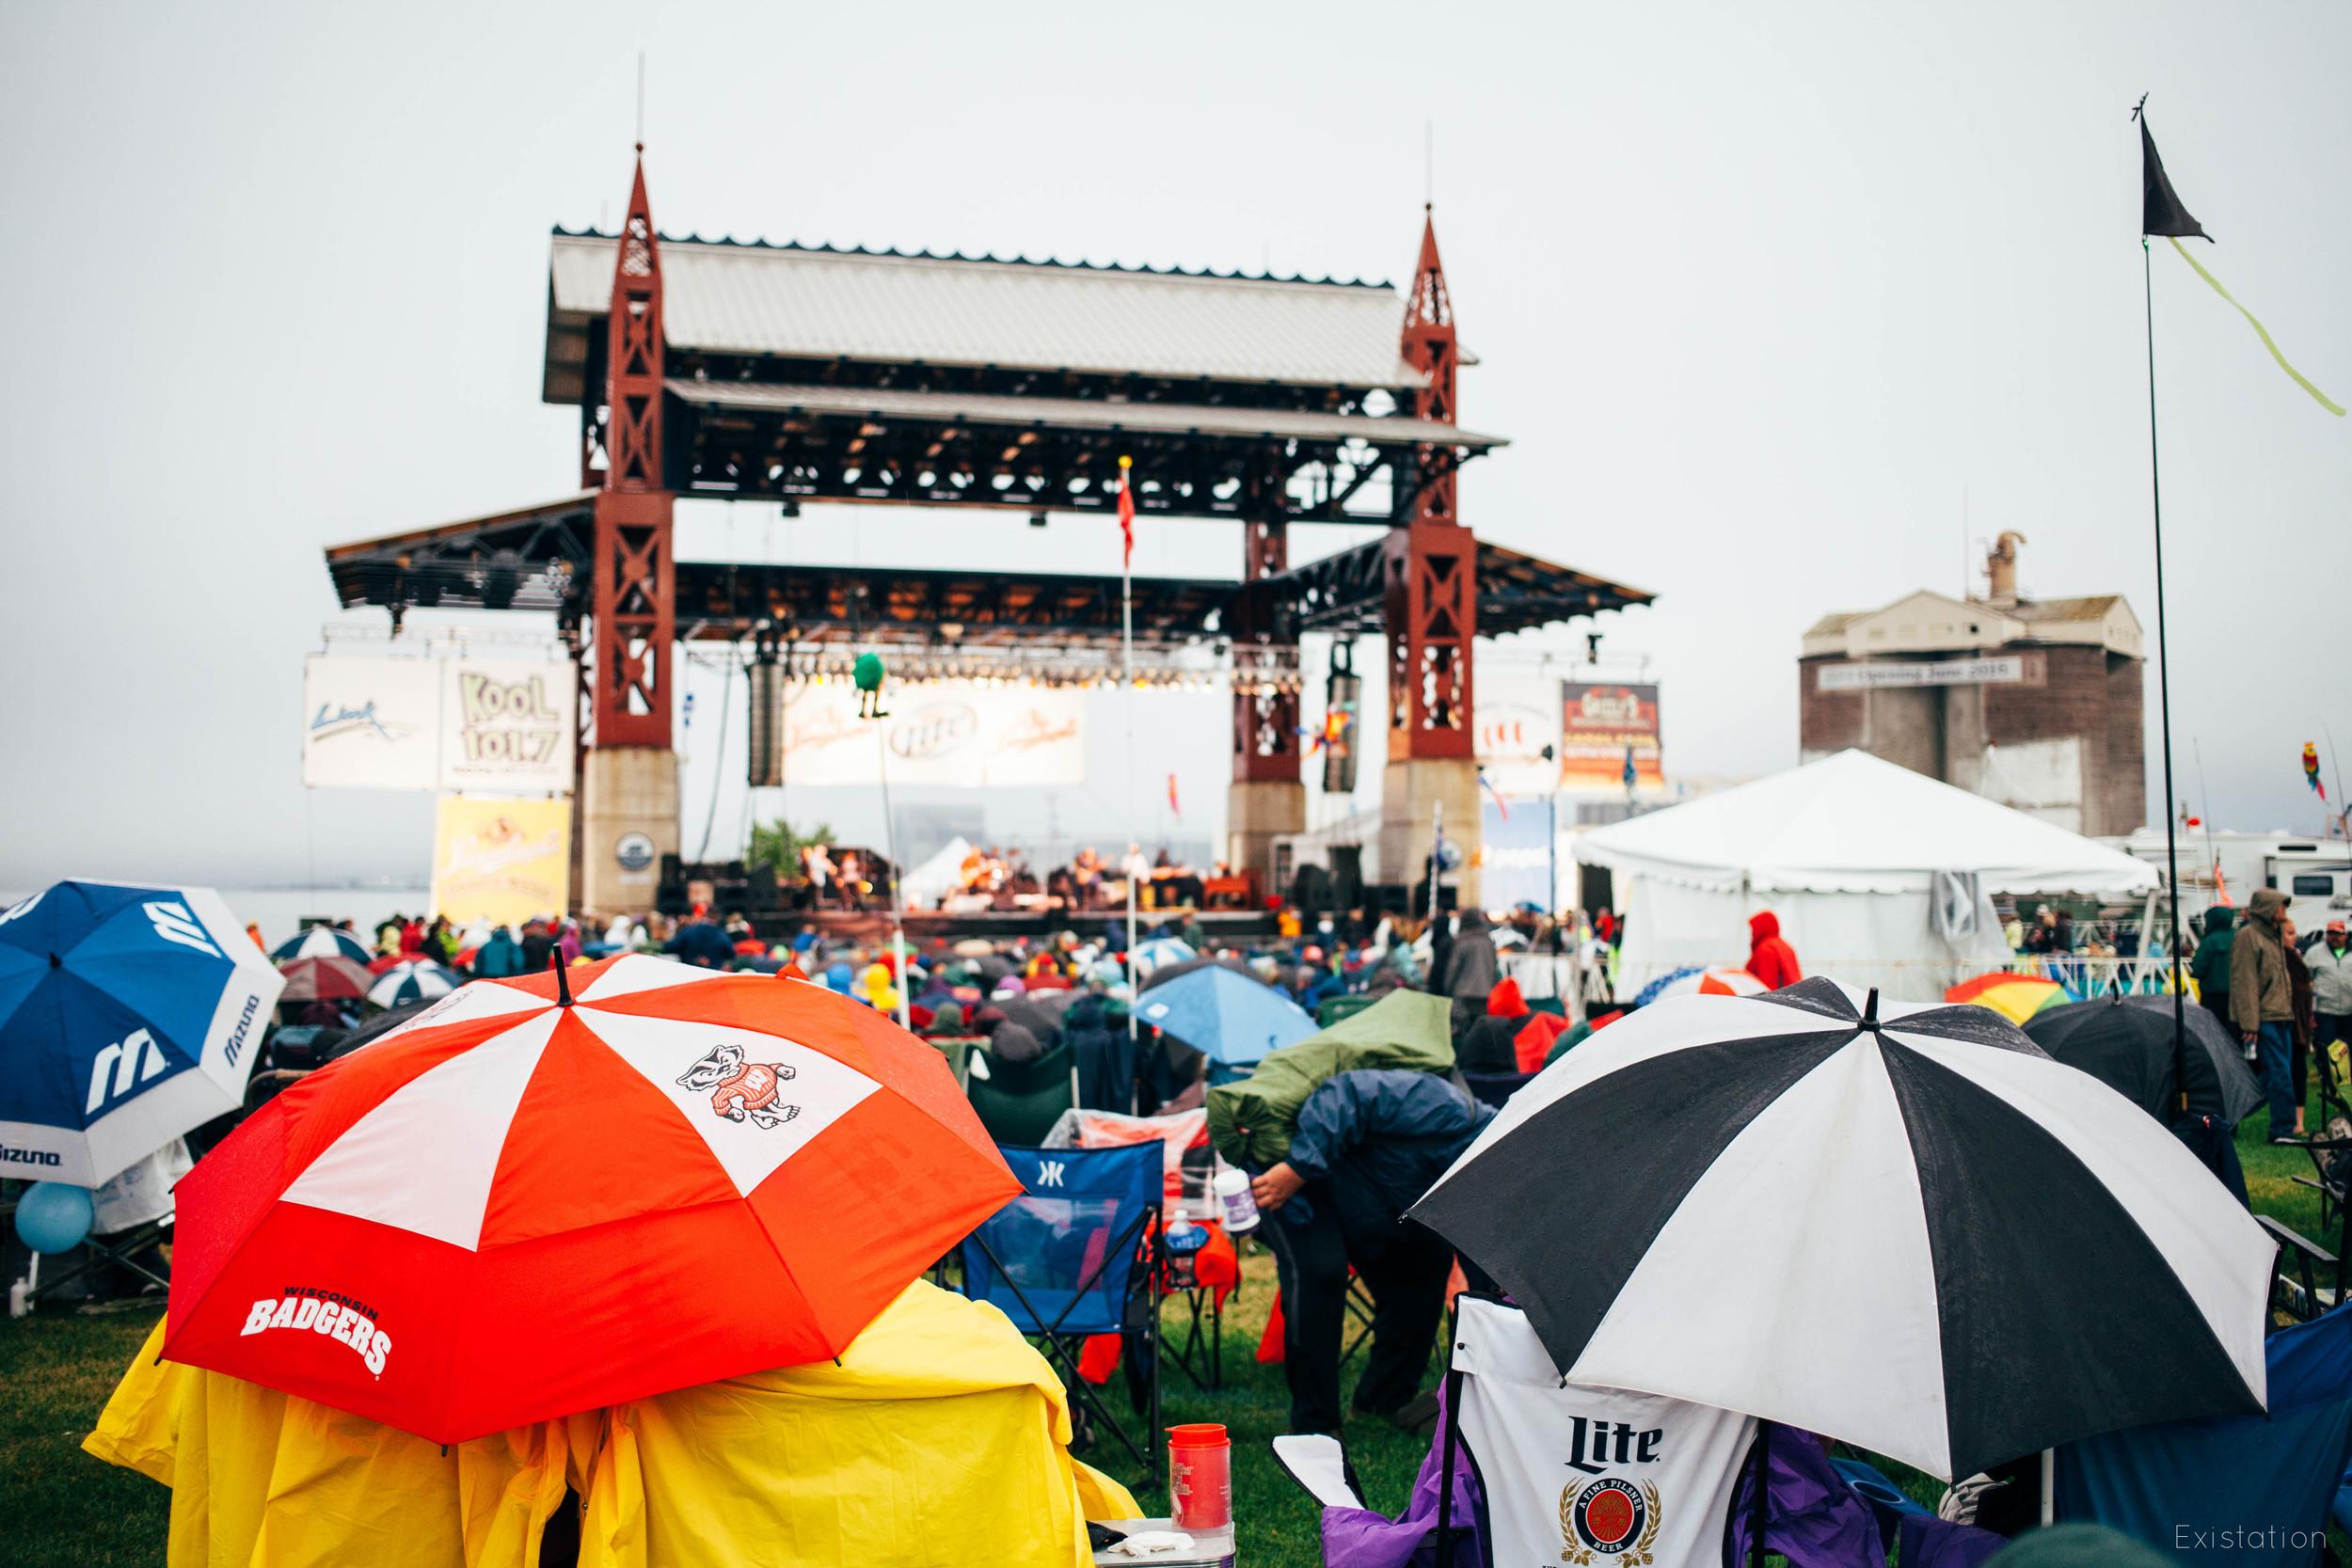 bayfront blues festival rainy.jpg